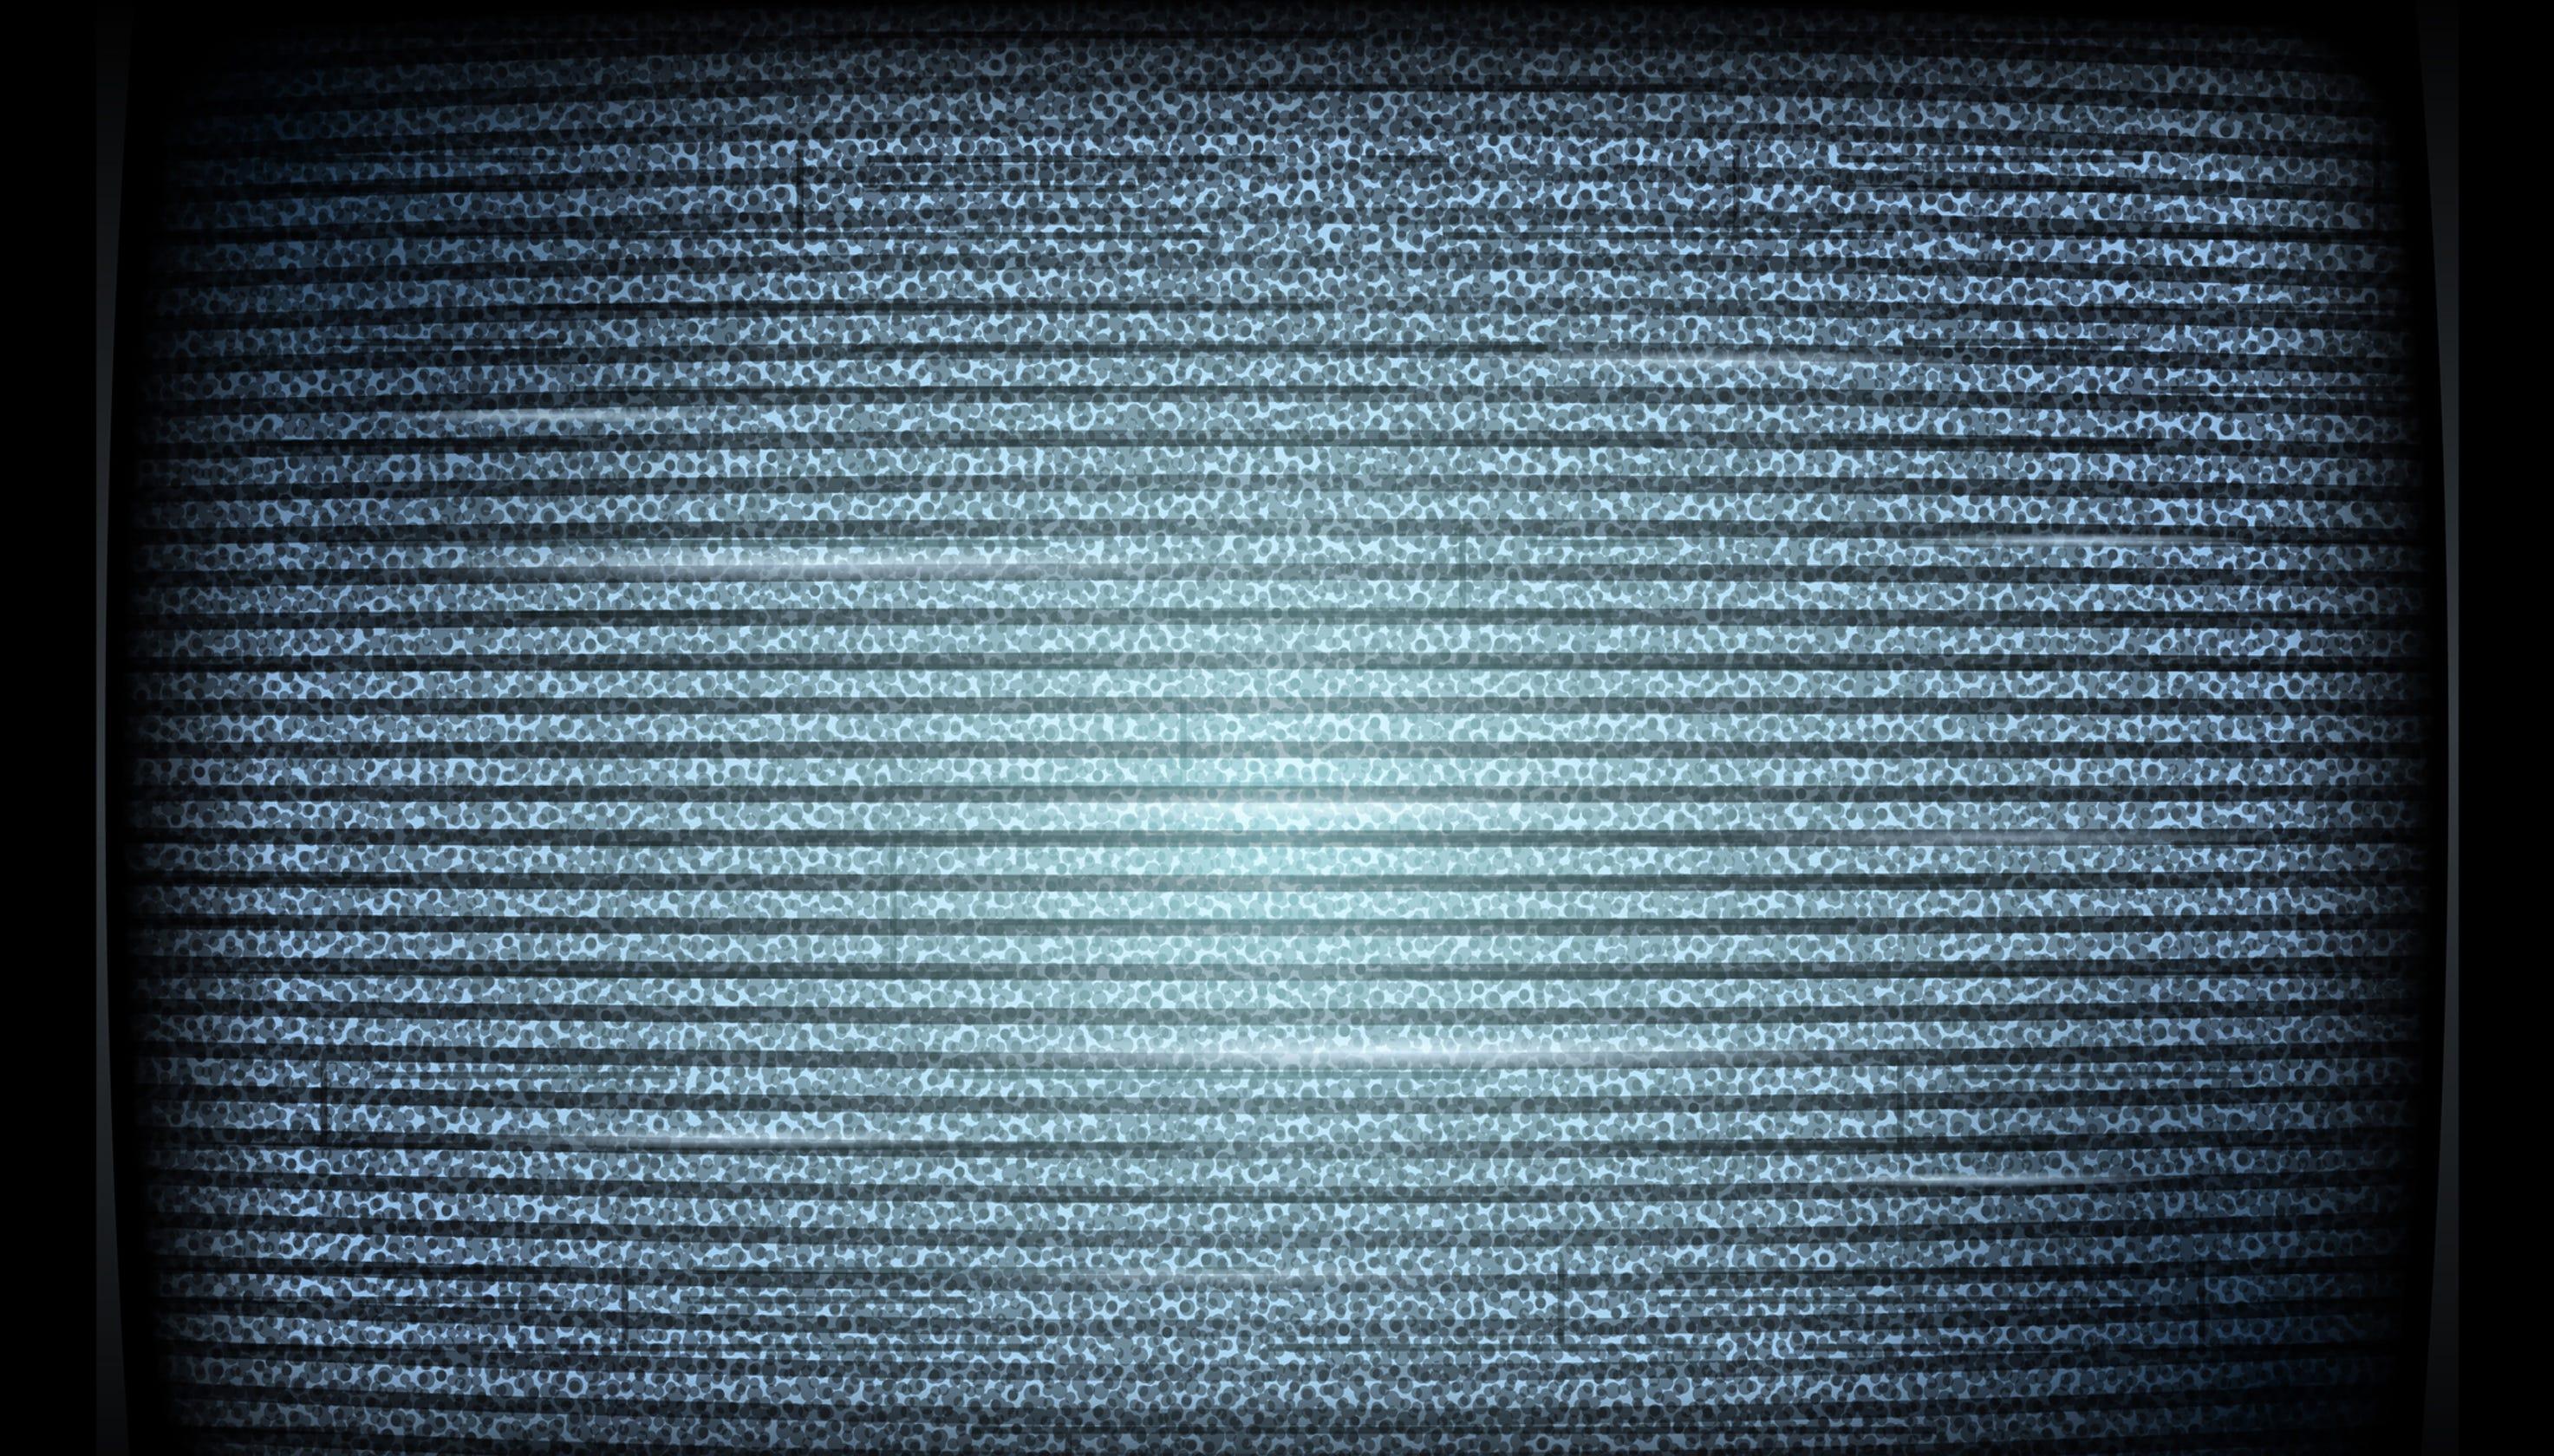 13WHAM goes dark for DirecTV customers